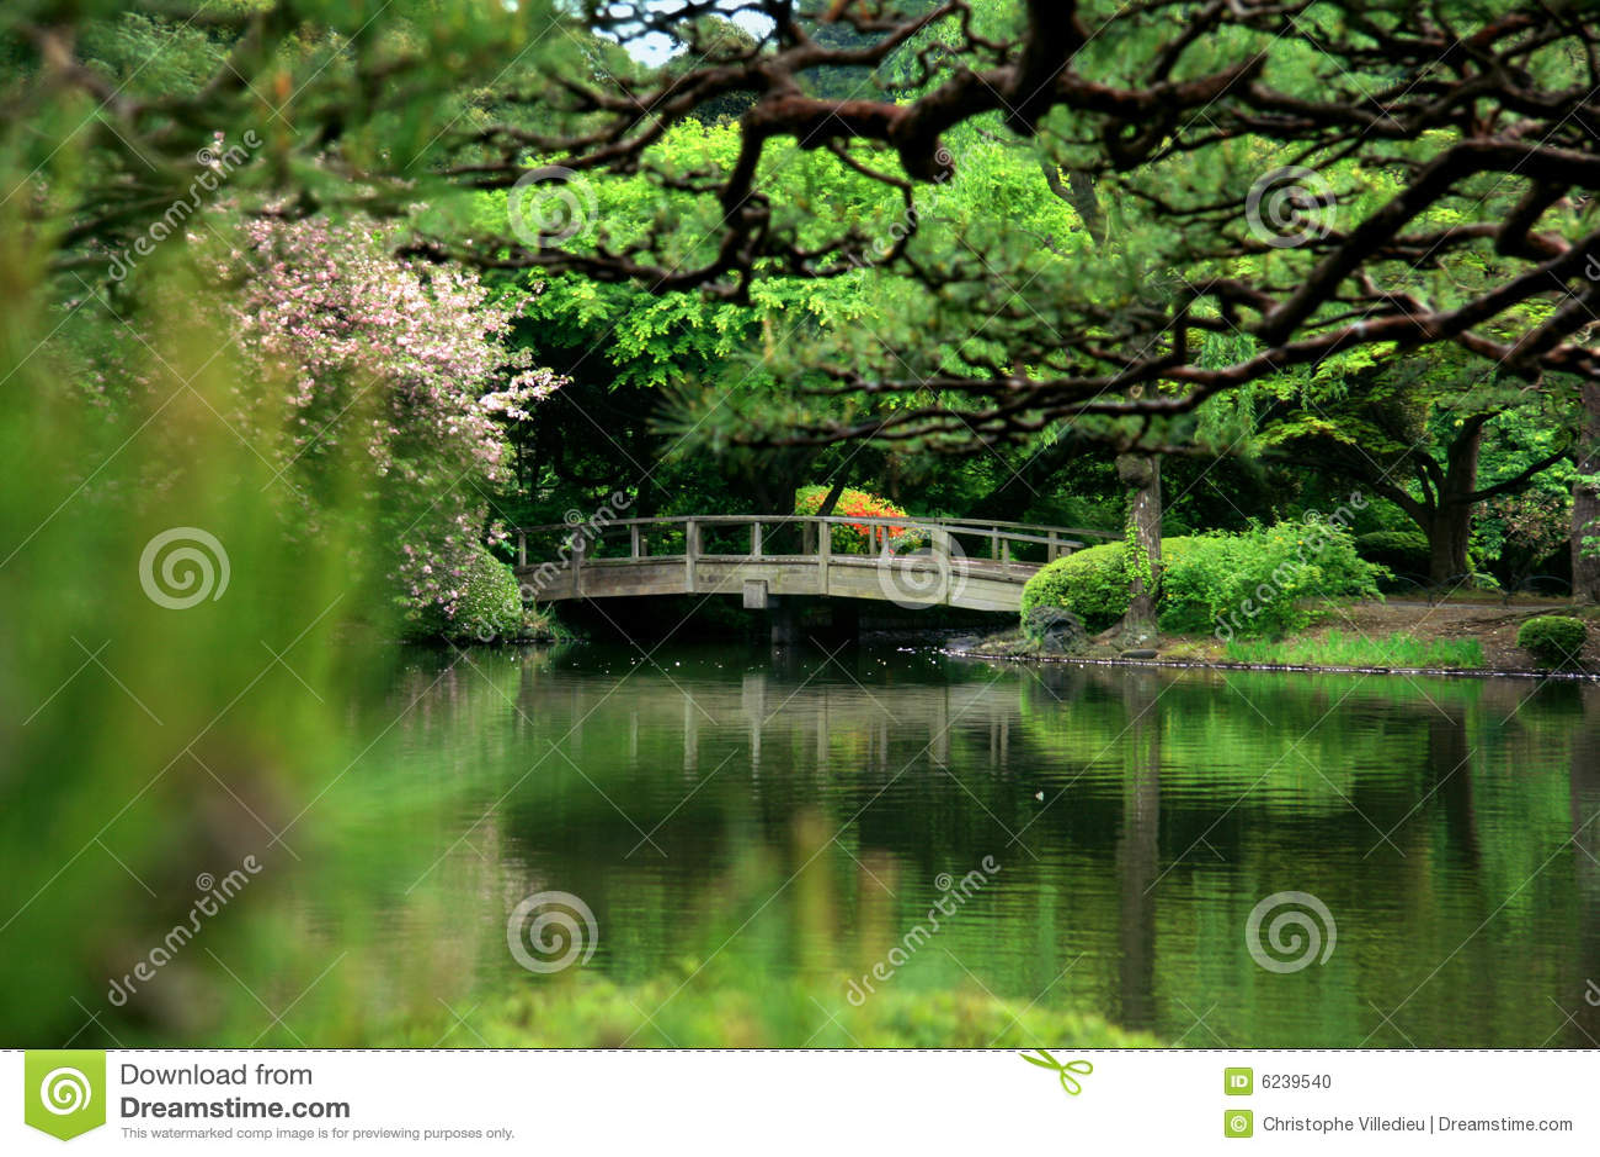 Cherry Blossom And Bridge Stock Photo Image Of Arch Lake 6239540